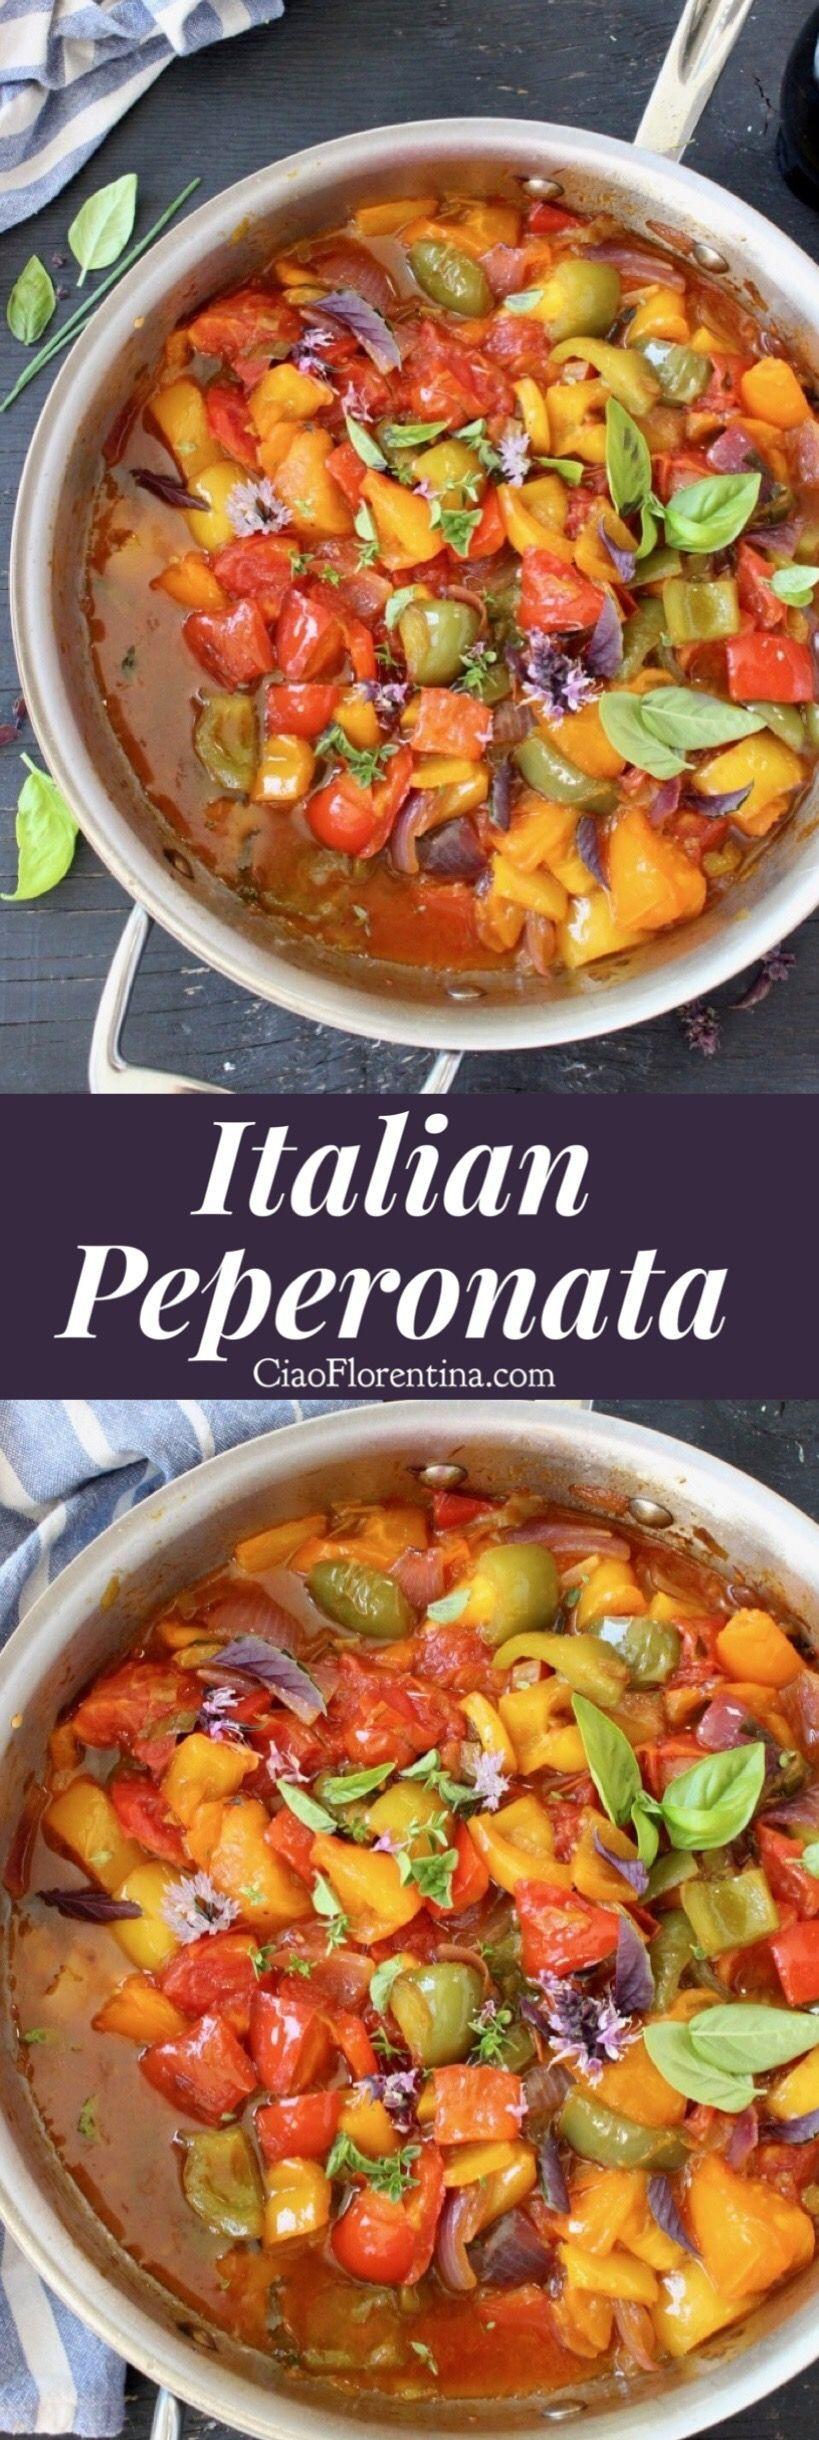 Peperonata Peperonata Recipe, a Southern Italian sauce / stew traditionally from Calabria, made of stewed peppers, tomatoes and onions. Vegetarian, vegans and gluten free |  @CiaoFlorentinaPeperonata Recipe, a Southern Italian sauce / stew traditionally from Calabria, made of stewed peppers, tomatoes and onions. V...